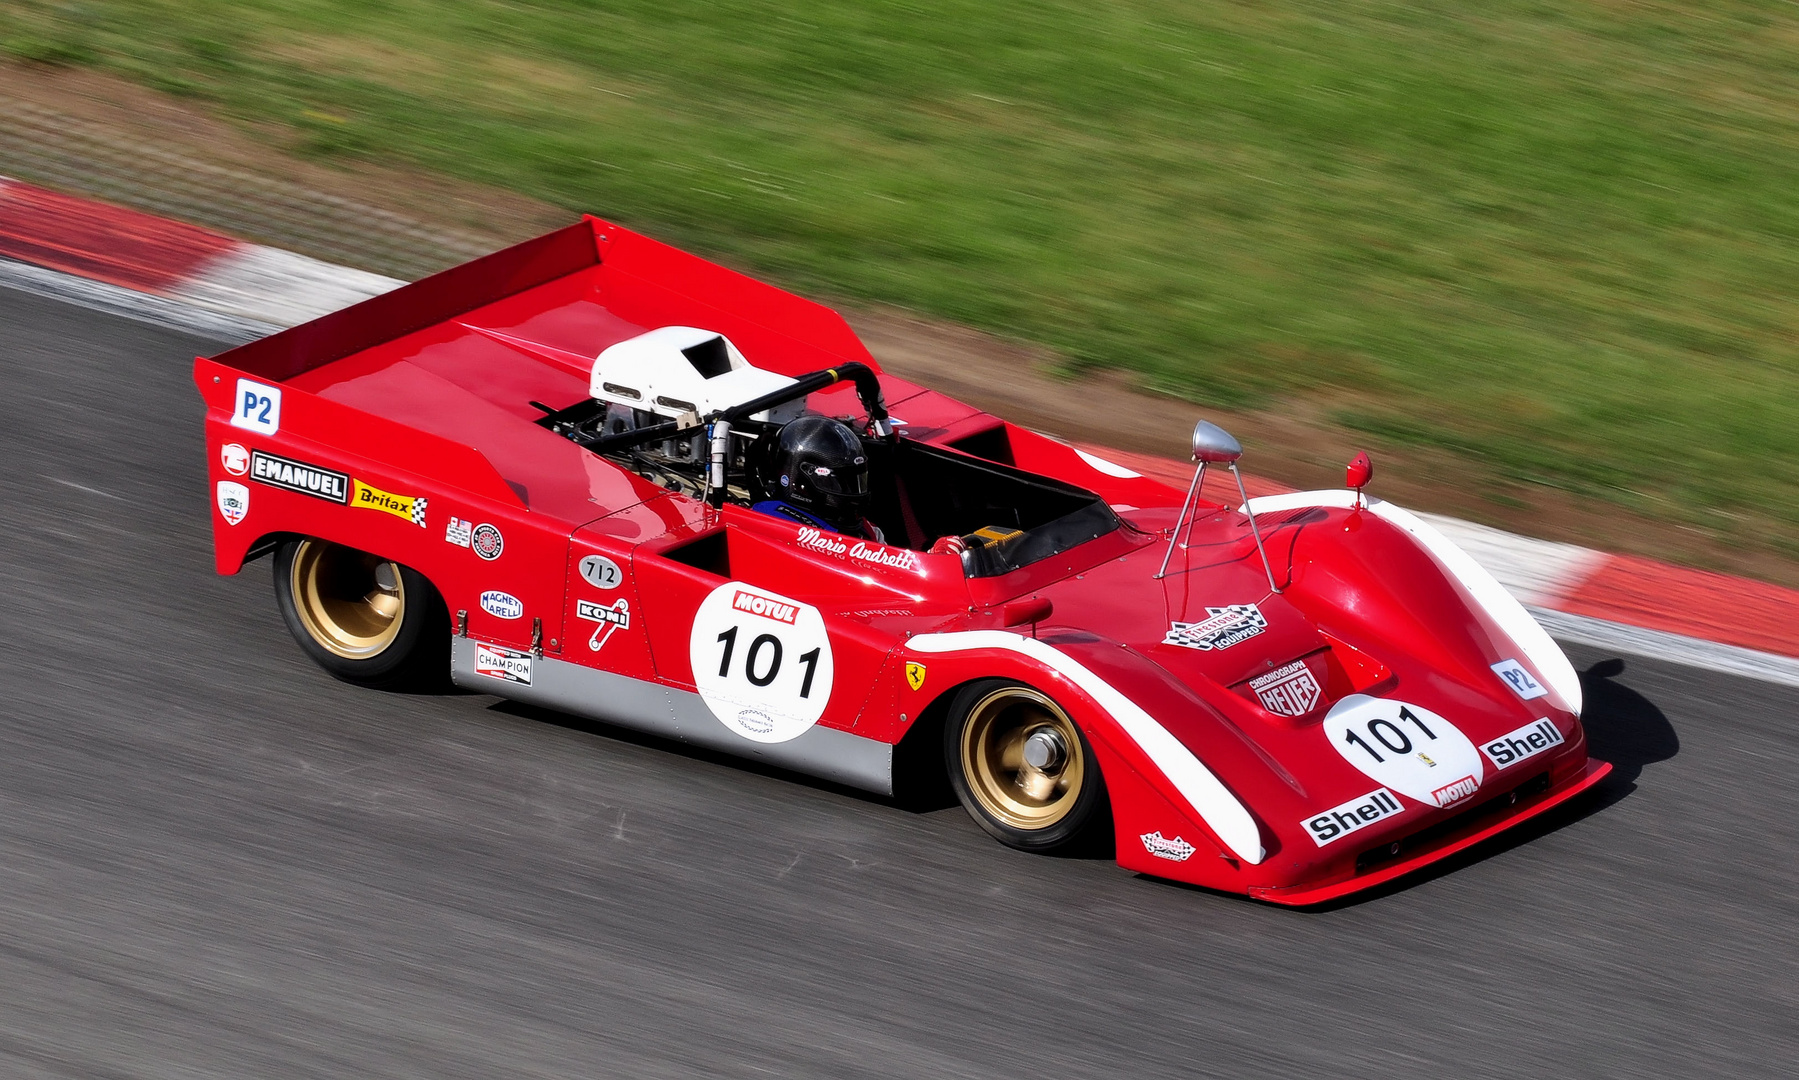 Ferrari allesisterlaubt Wochen #8